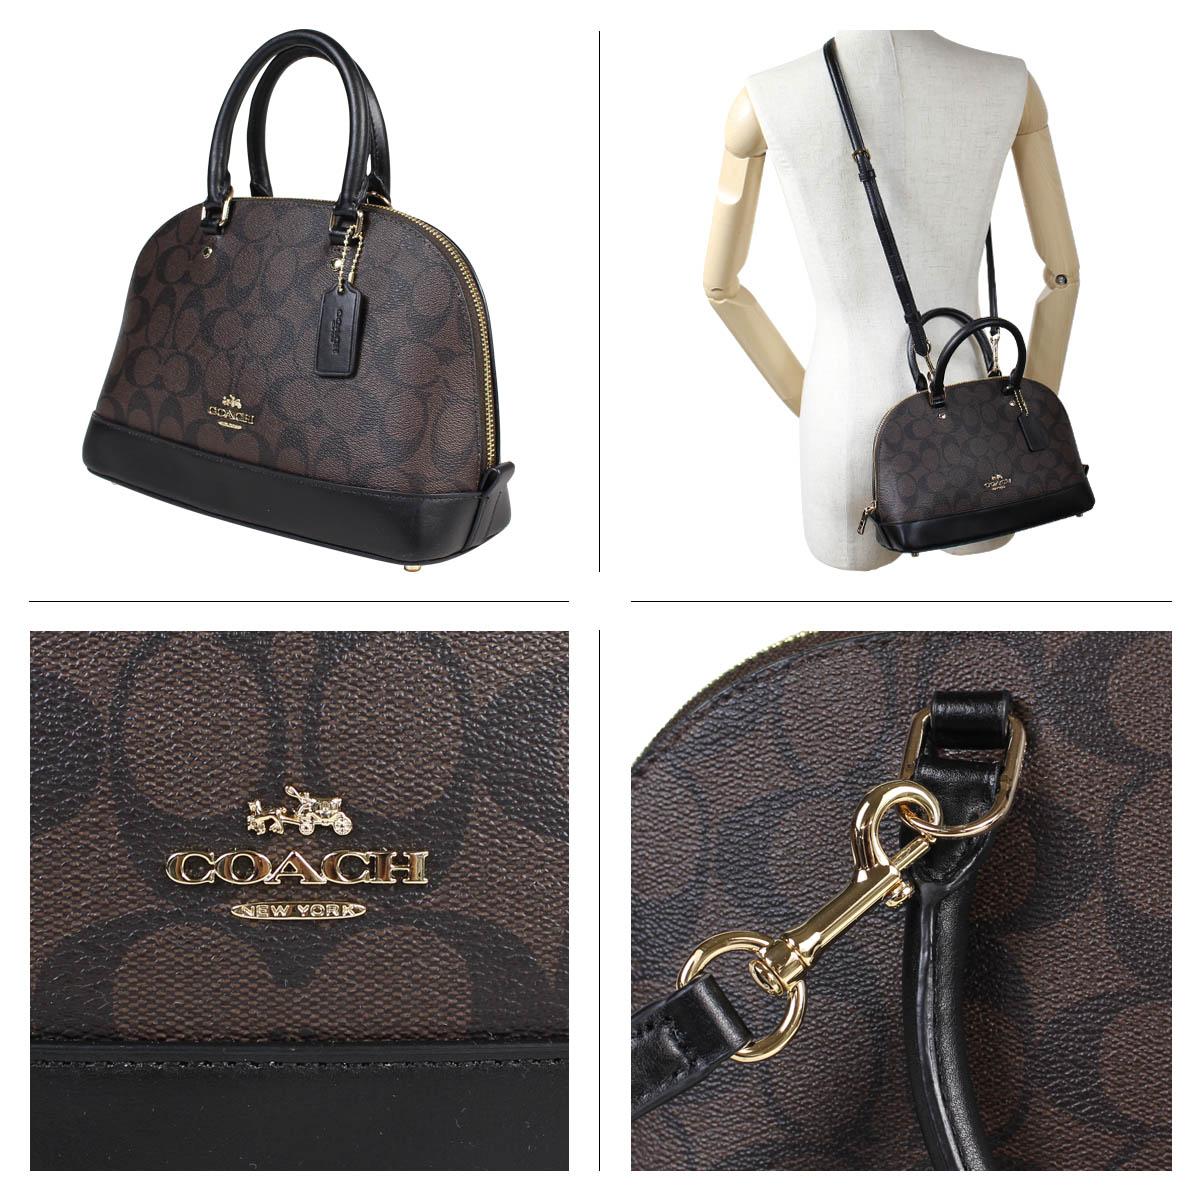 4bf10cf44bd9 COACH coach bag shoulder bag Lady s MINI SIERRA SATCHEL IN SIGNATURE COATED  CANVAS F59295 brown  11 13 Shinnyu load